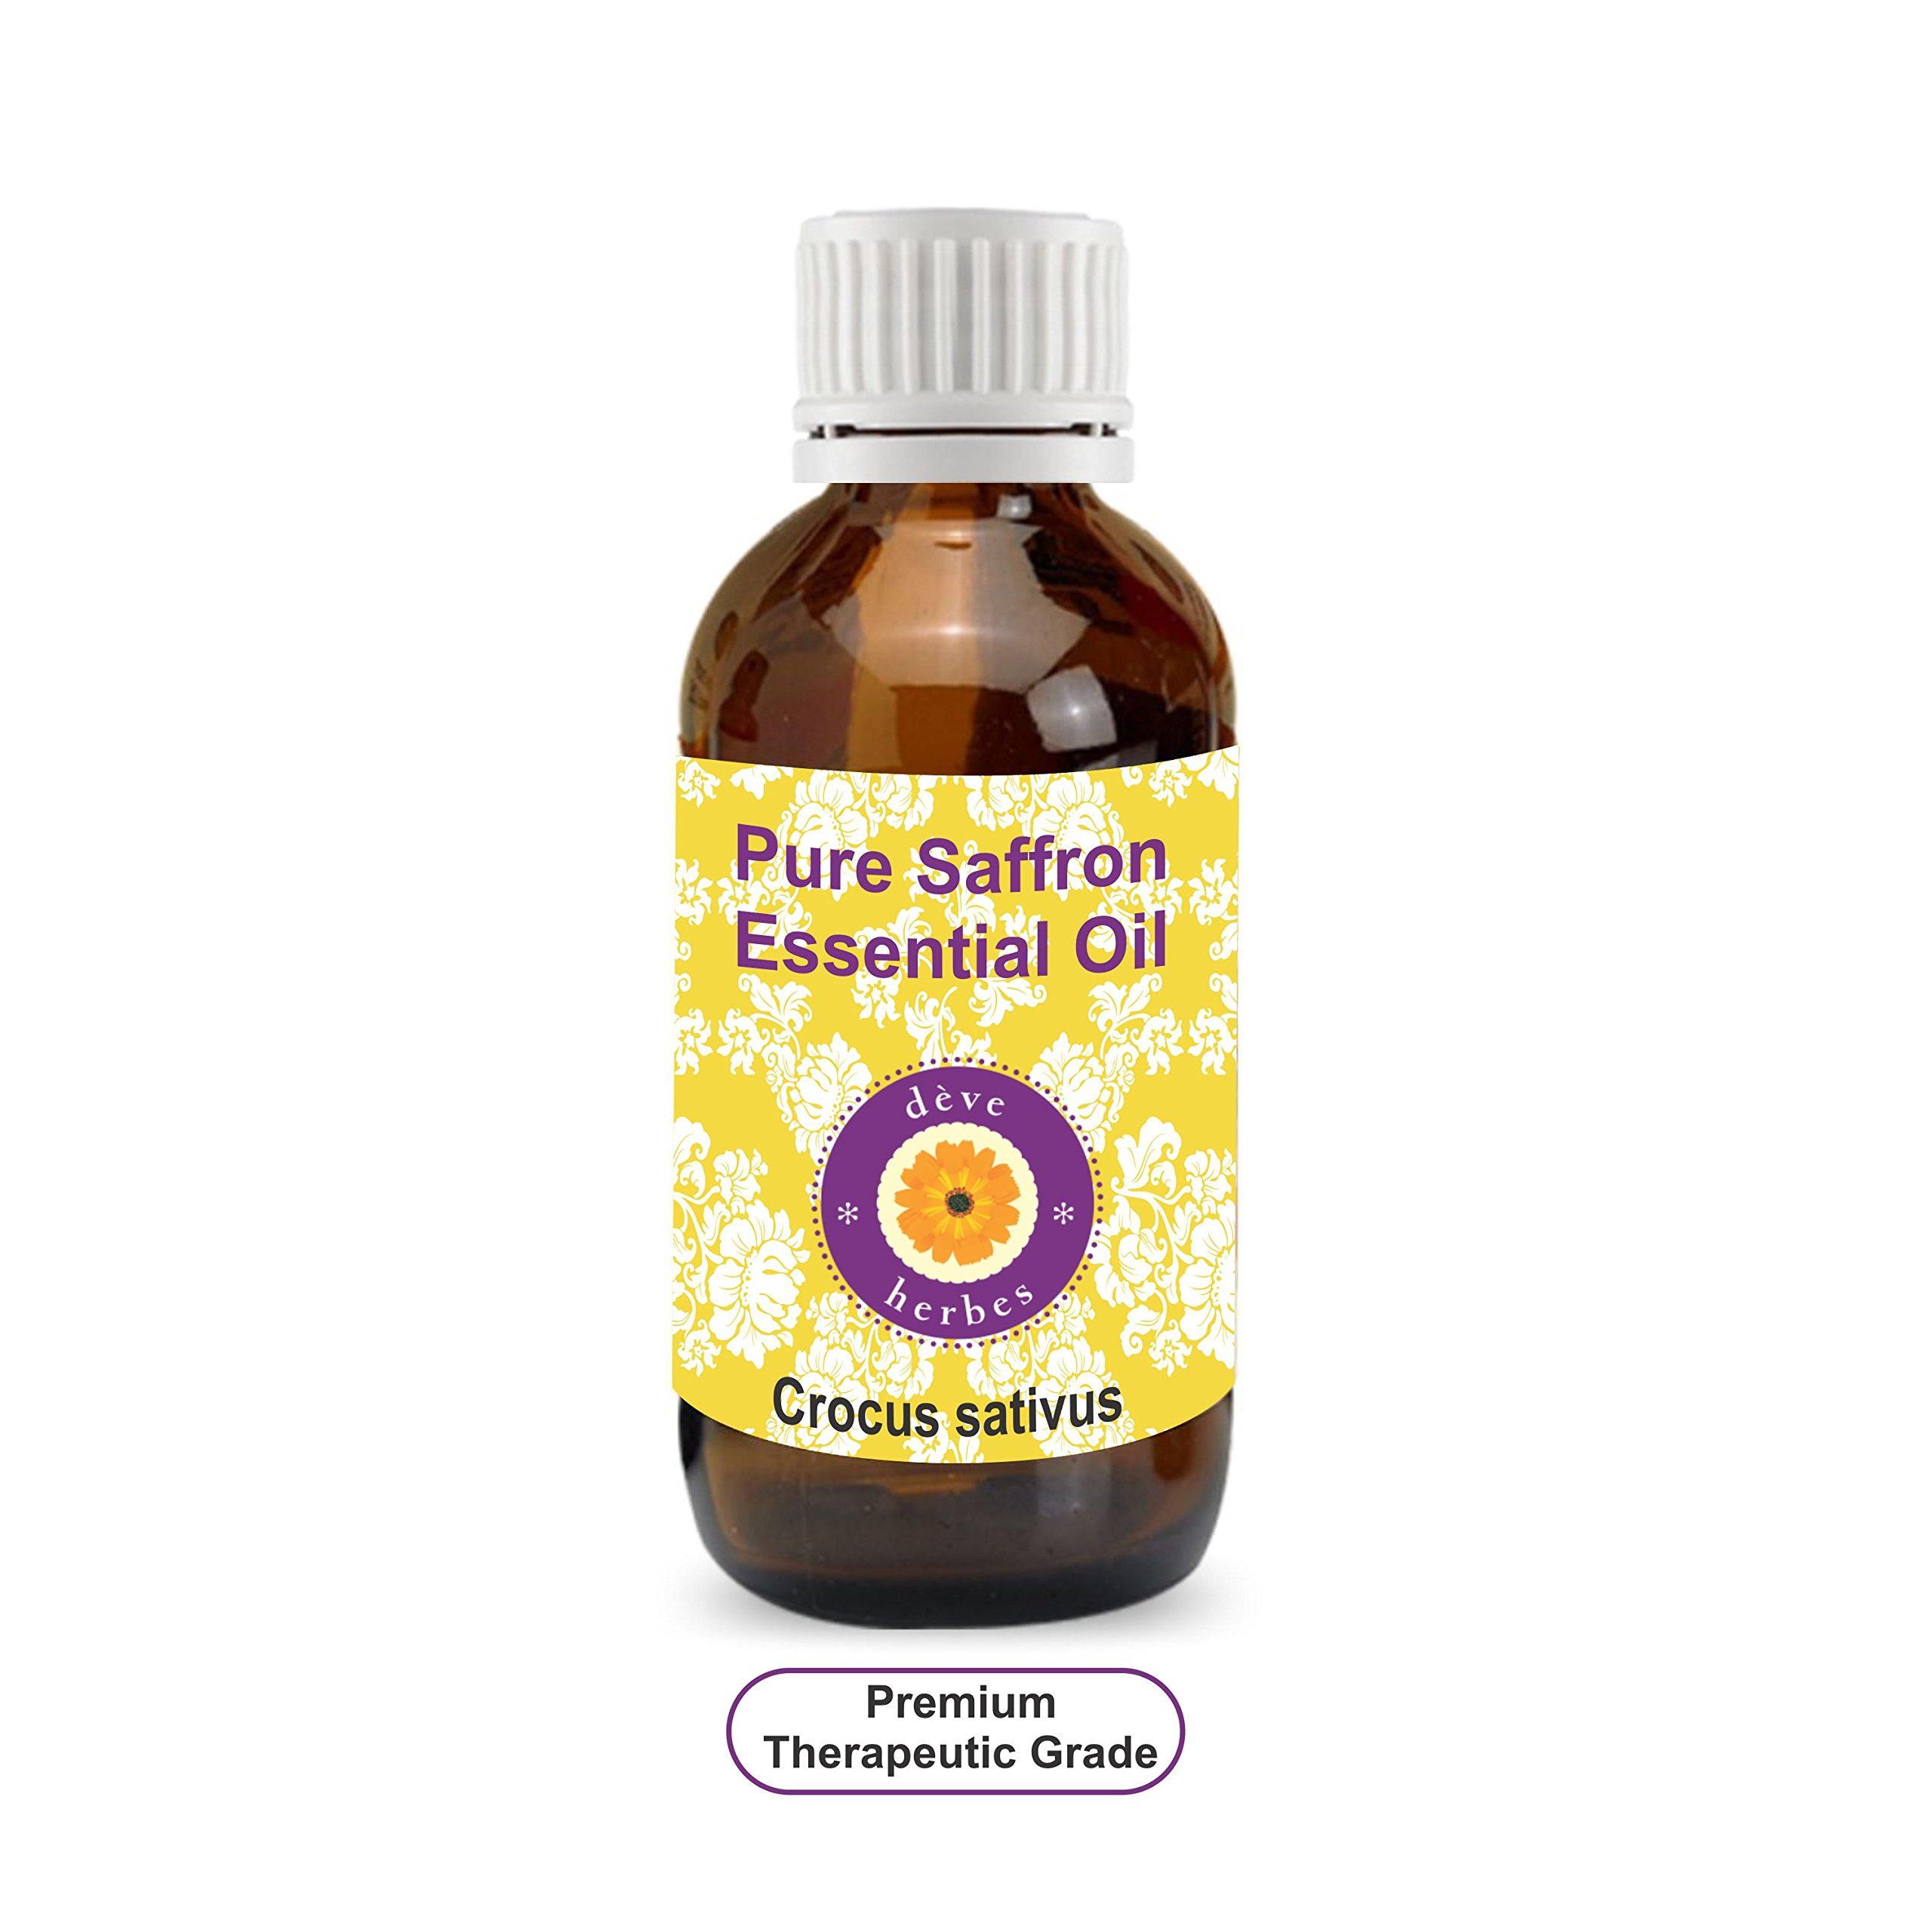 Deve Herbes Pure Saffron Essential Oil (Crocus sativus) 100% Natural Therapeutic Grade Steam Distilled 10ml (0.33 oz) by Deve Herbes